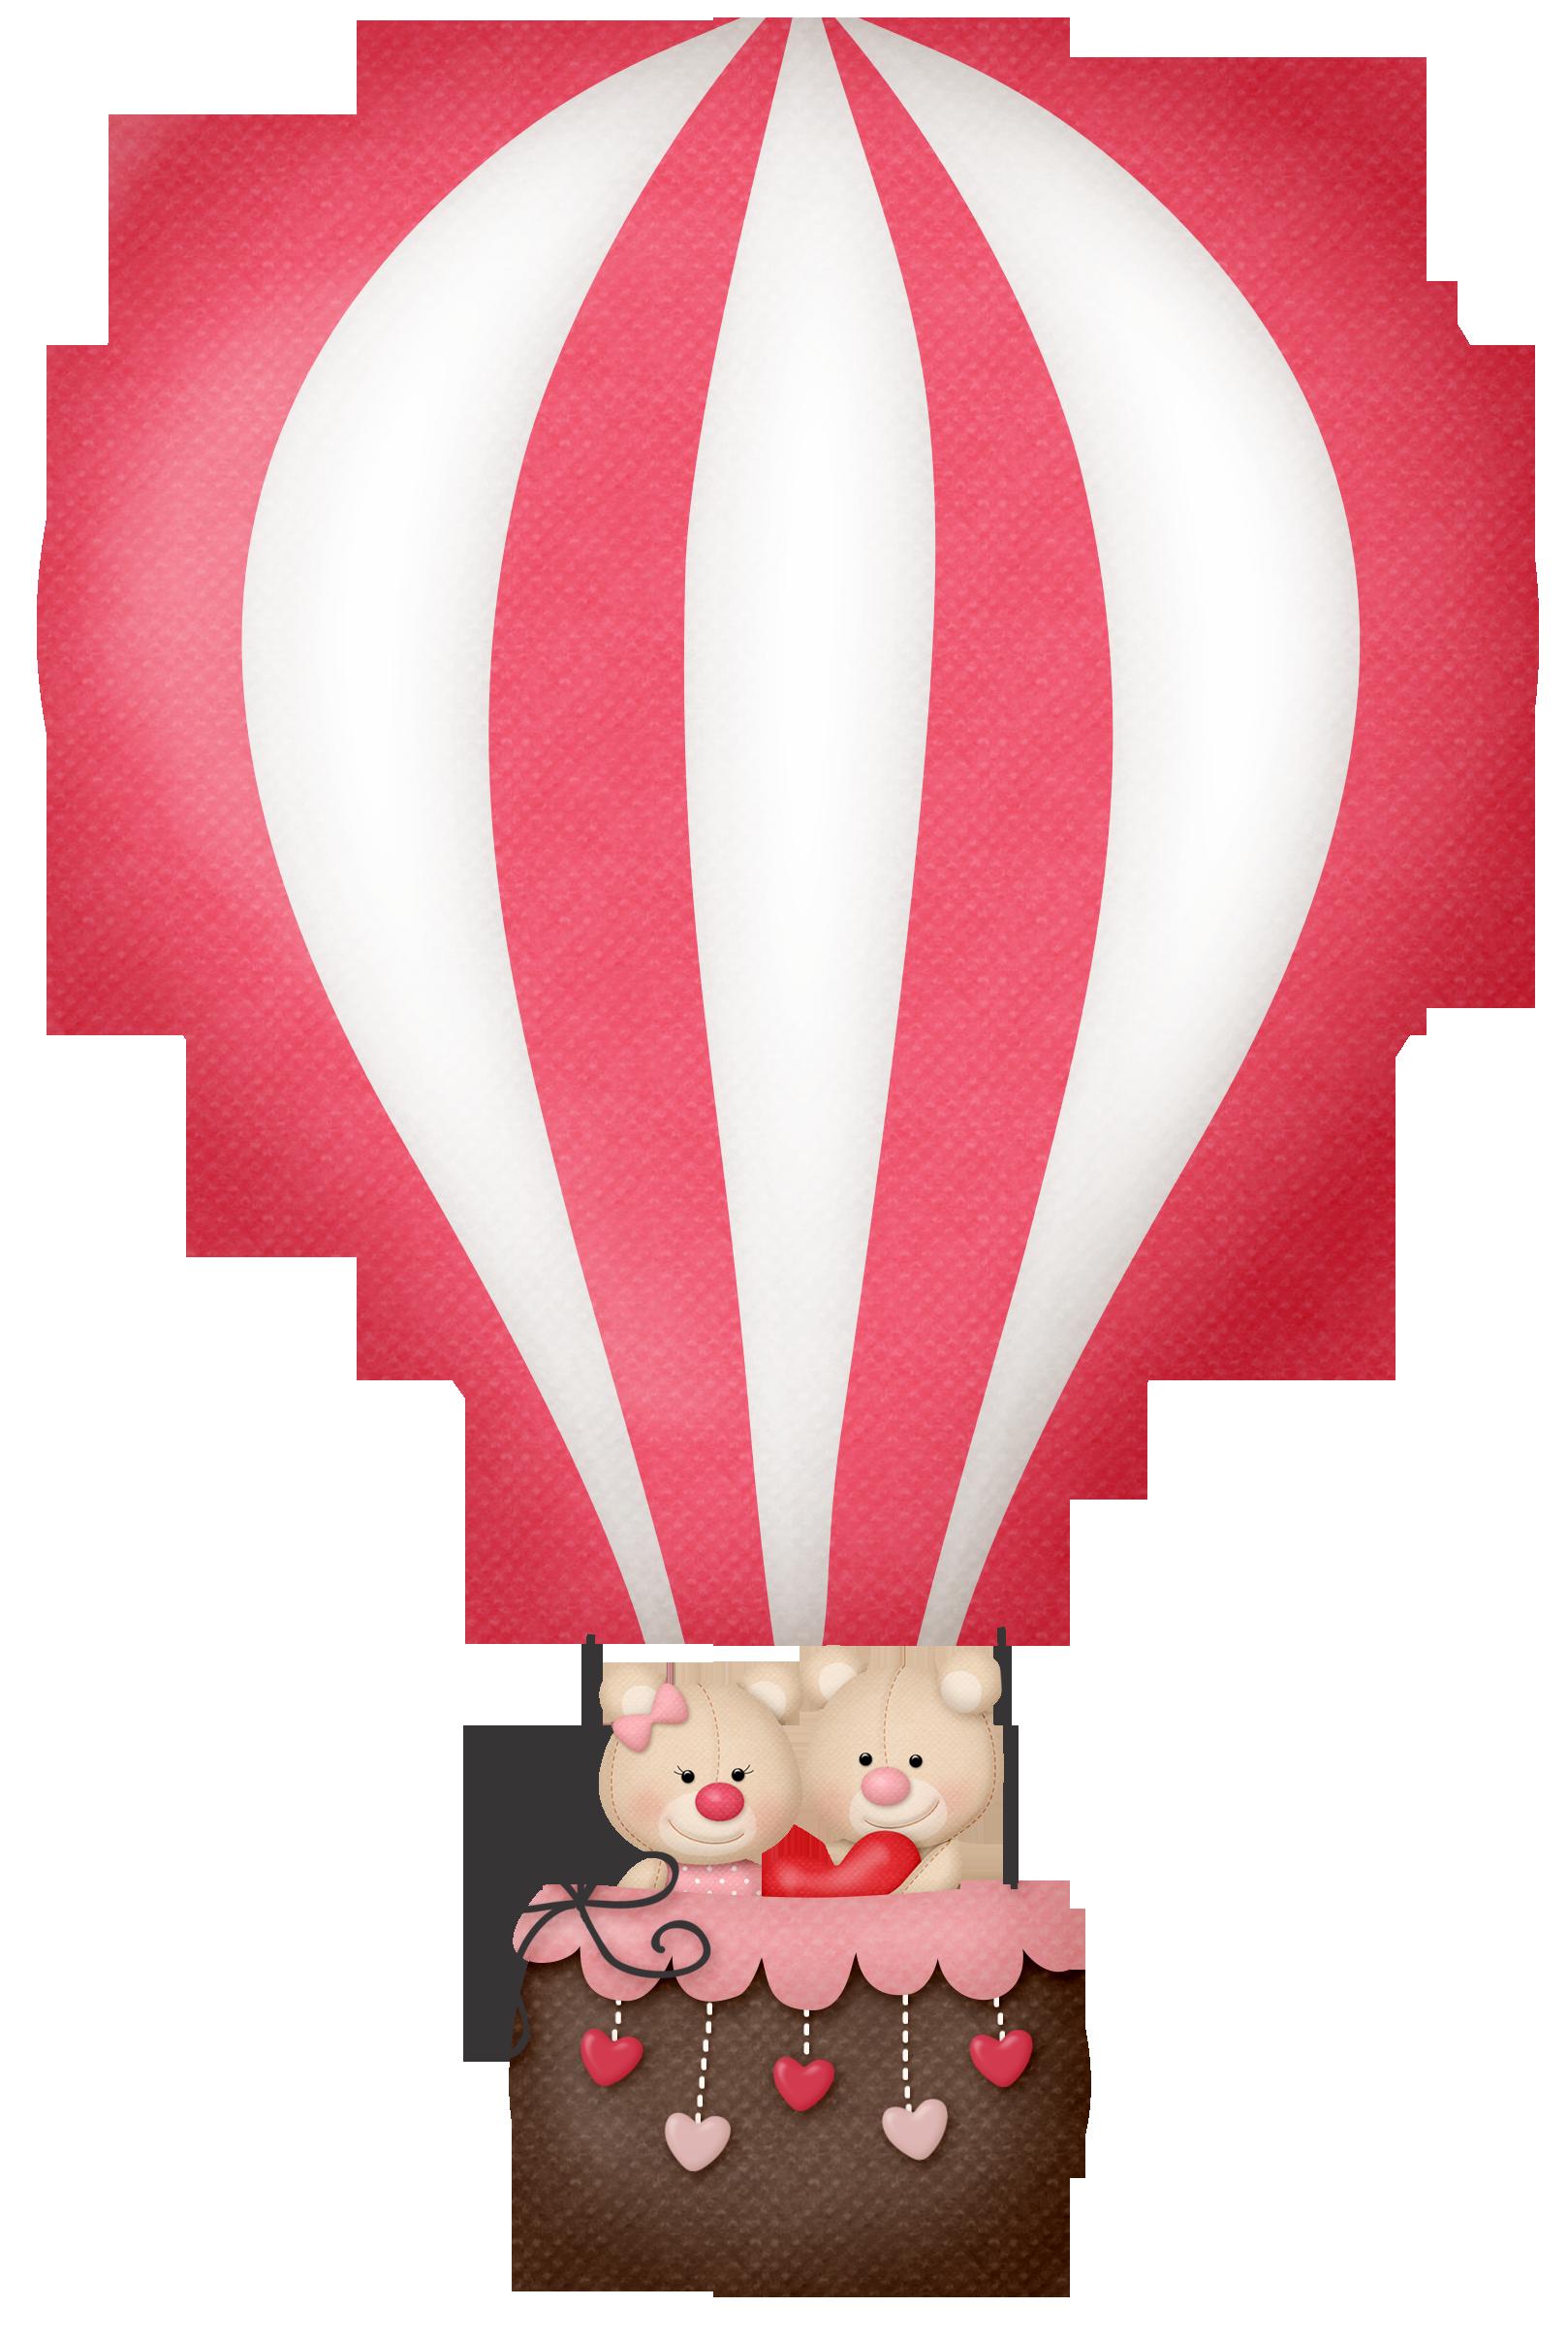 Clipart kite pastel. Pin by adri machado